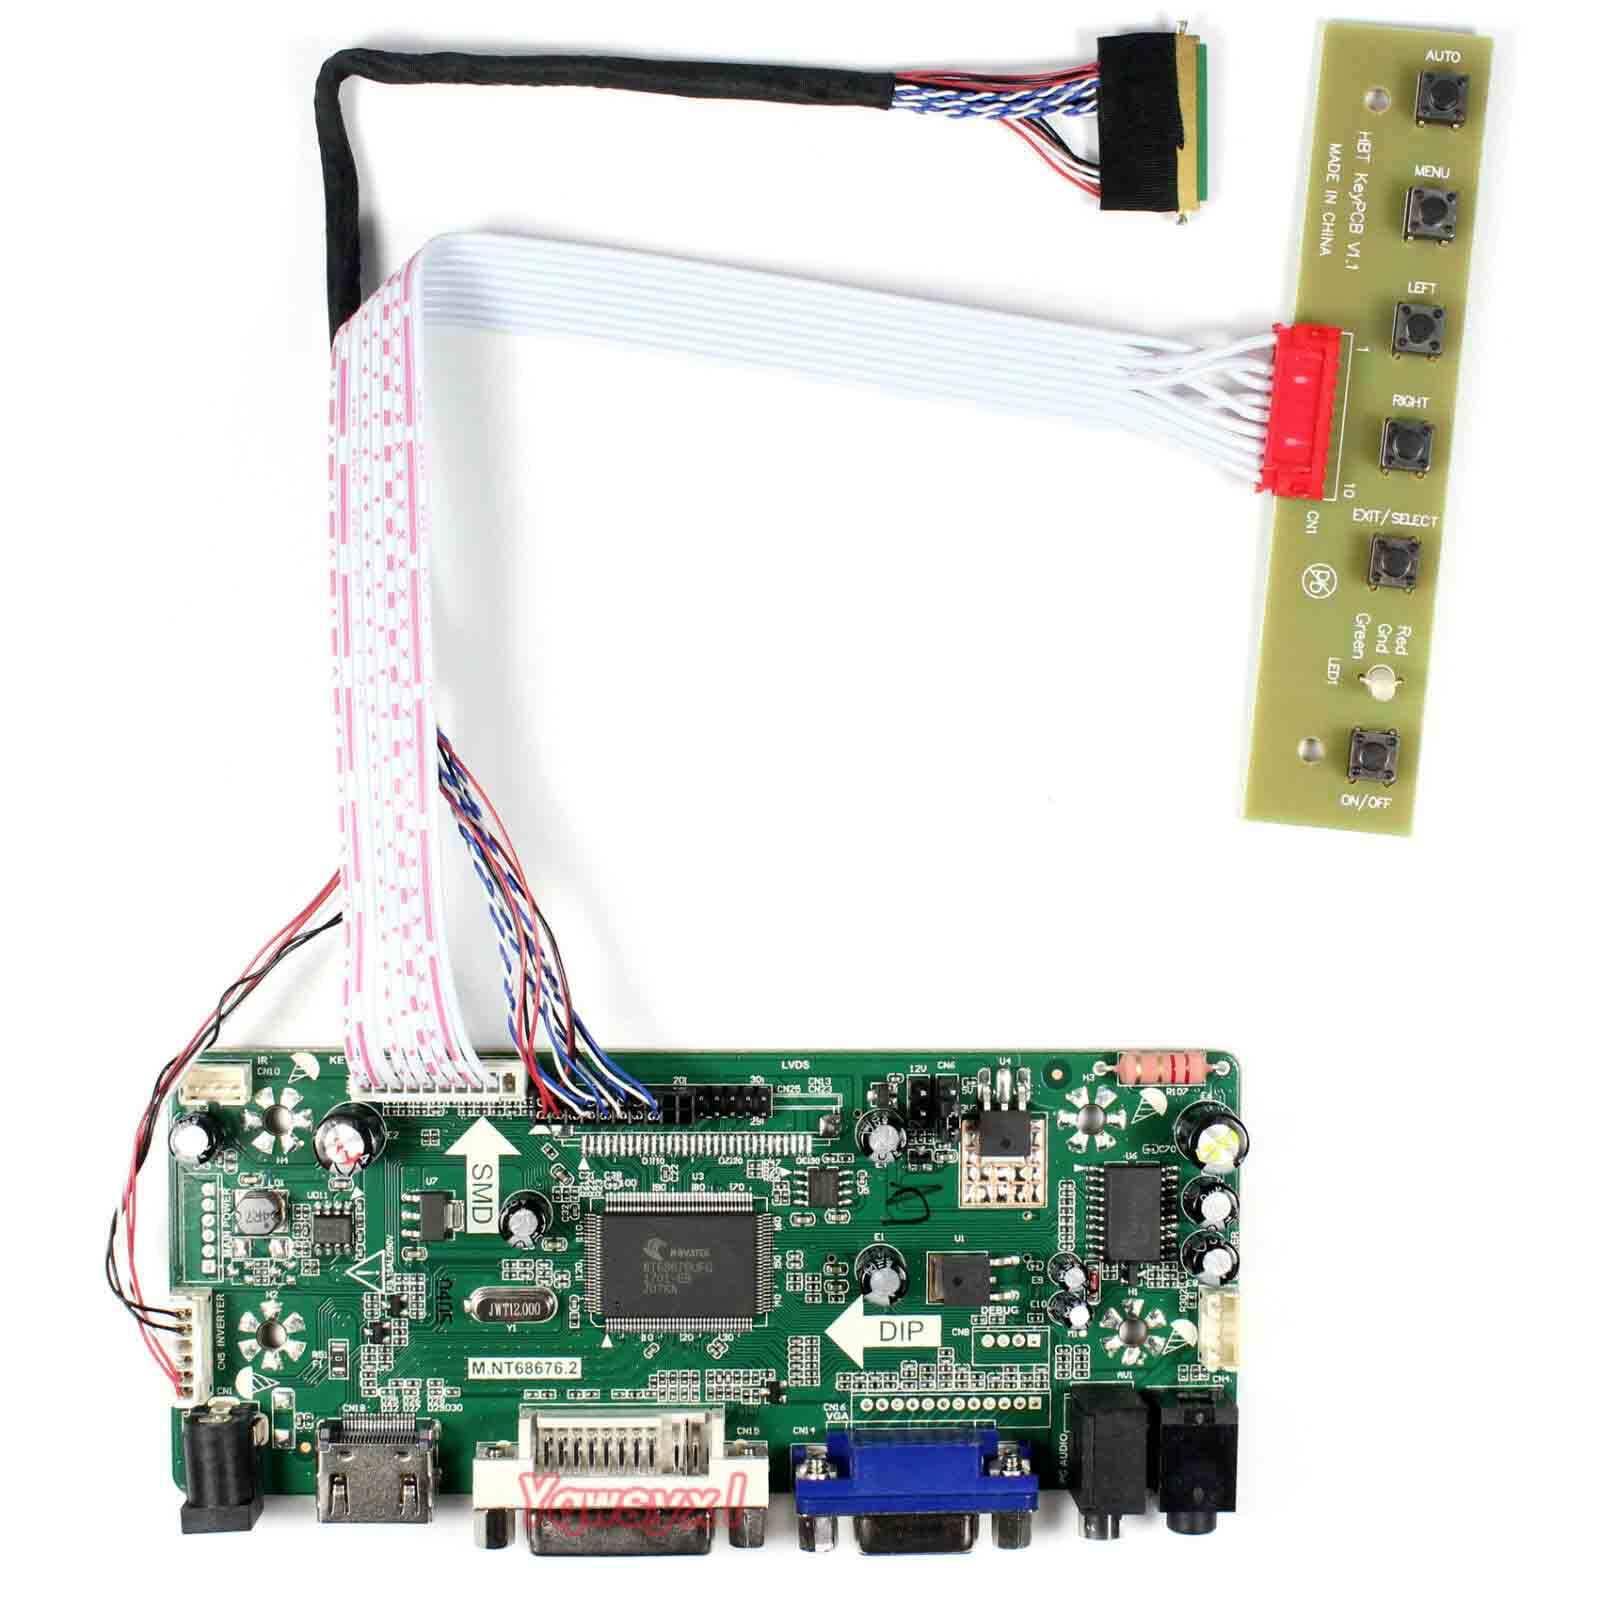 Yqwsyxl HDMI+VGA+DVI+Audio LCD Controller Board M.NT68676 For 14inch LTN140AT02 LTN140AT07 HT140WXB HSD141PHW11366x768 Lcd Panel